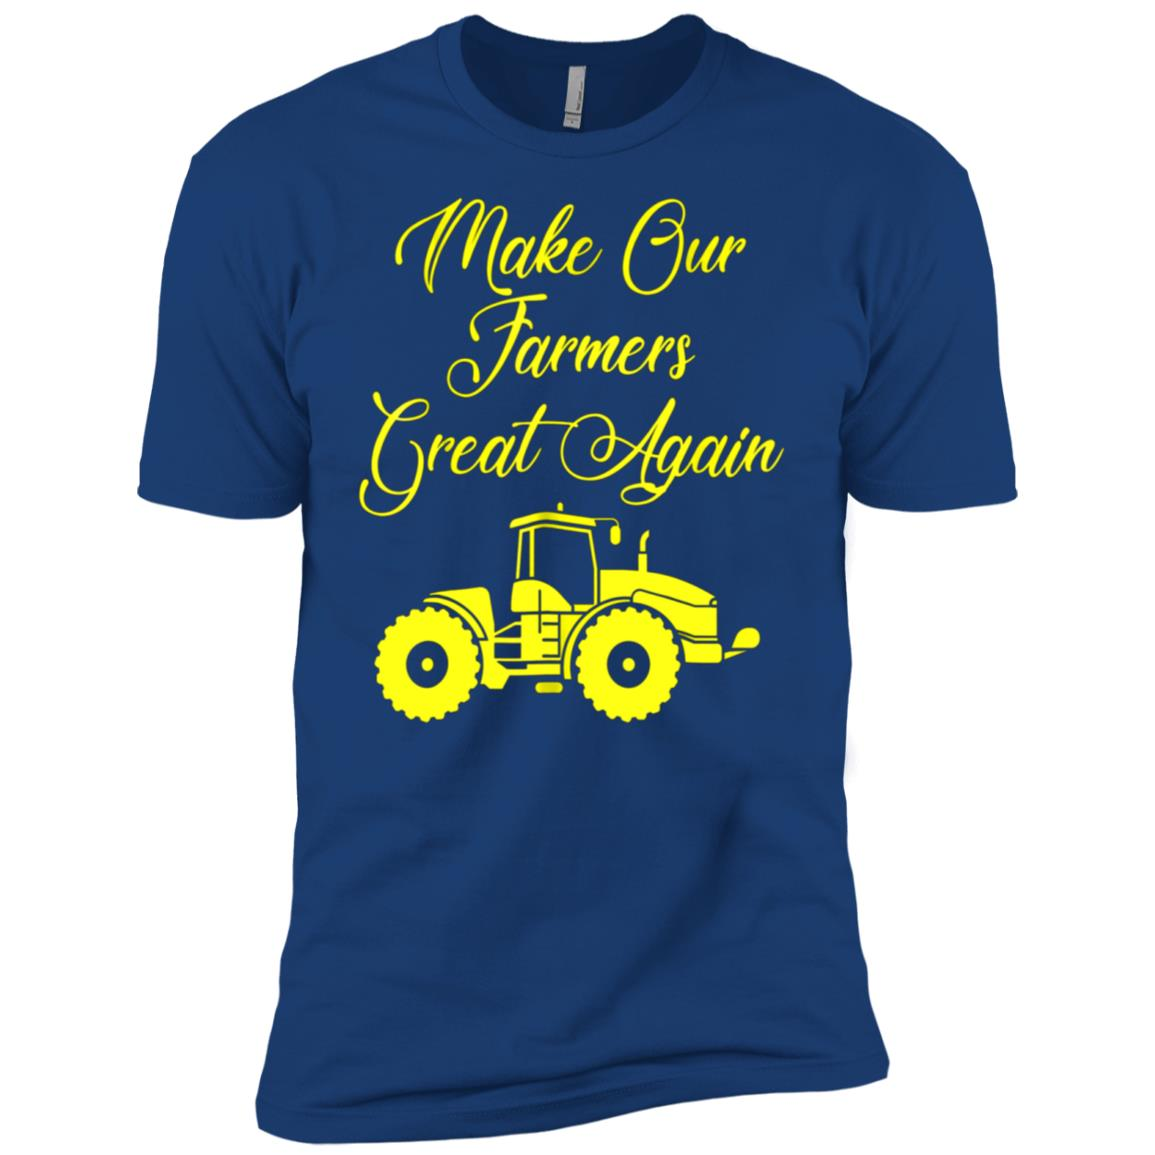 Make Our Farmers Great Again 2018 Gift Tee Men Short Sleeve T-Shirt